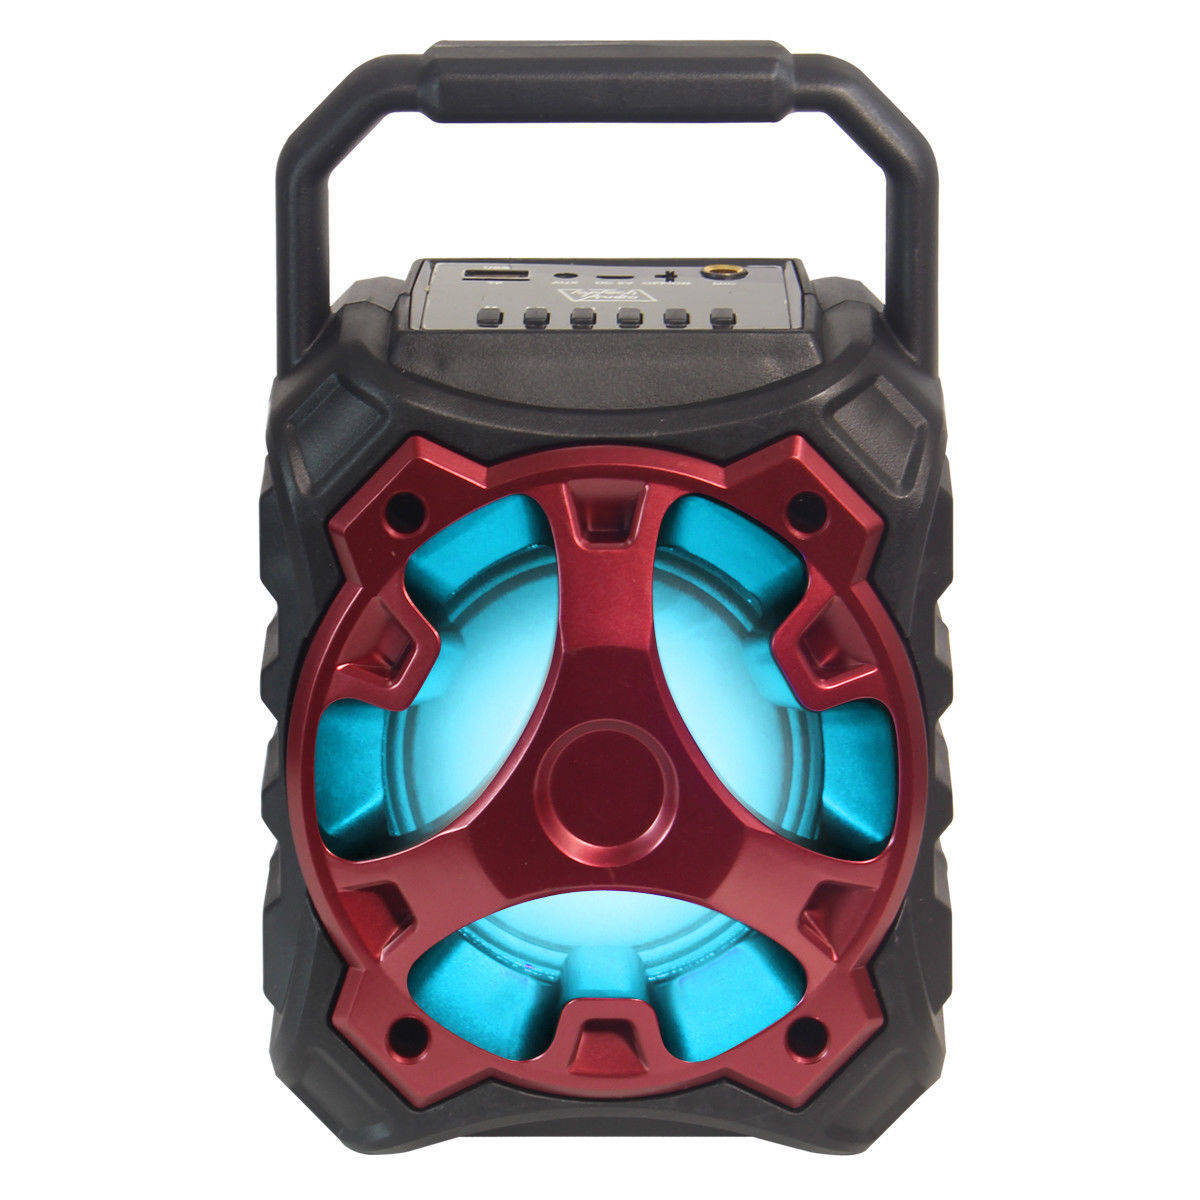 Fully Powered 500W Bluetooth Wireless Portable Multimedia Sp